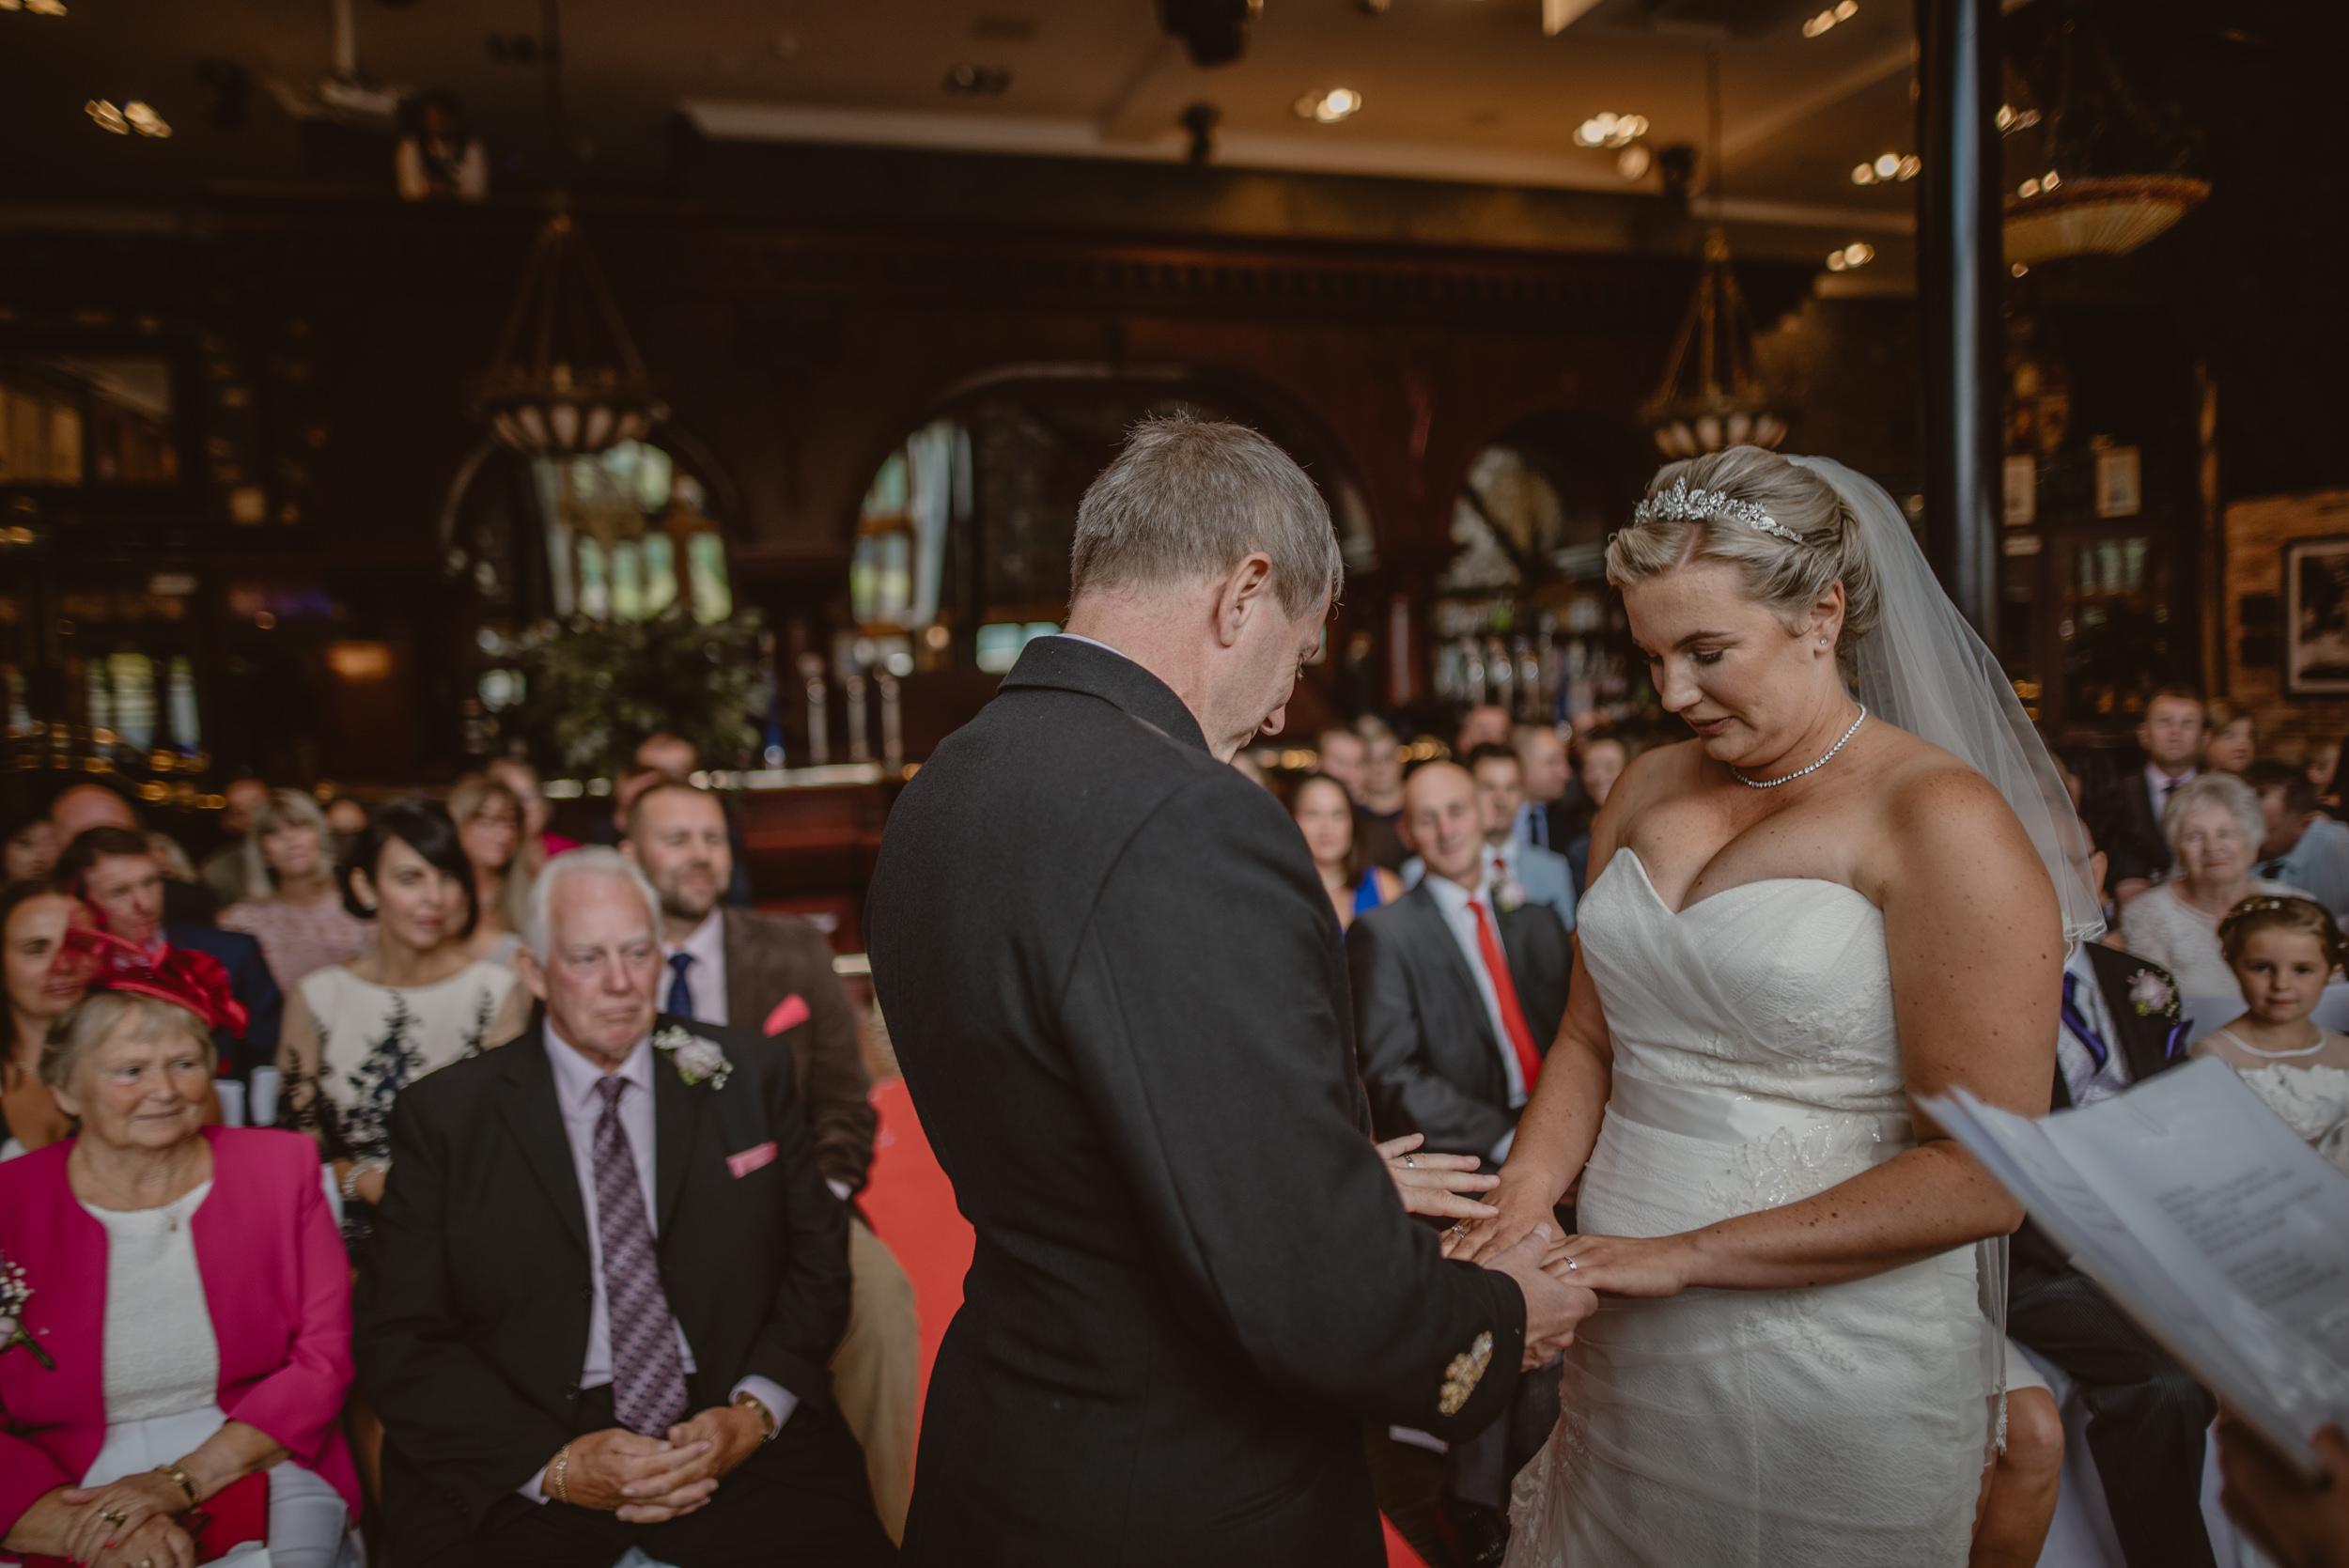 Chantelle-and-Stephen-Old-Thorns-Hotel-Wedding-Liphook-Manu-Mendoza-Wedding-Photography-223.jpg